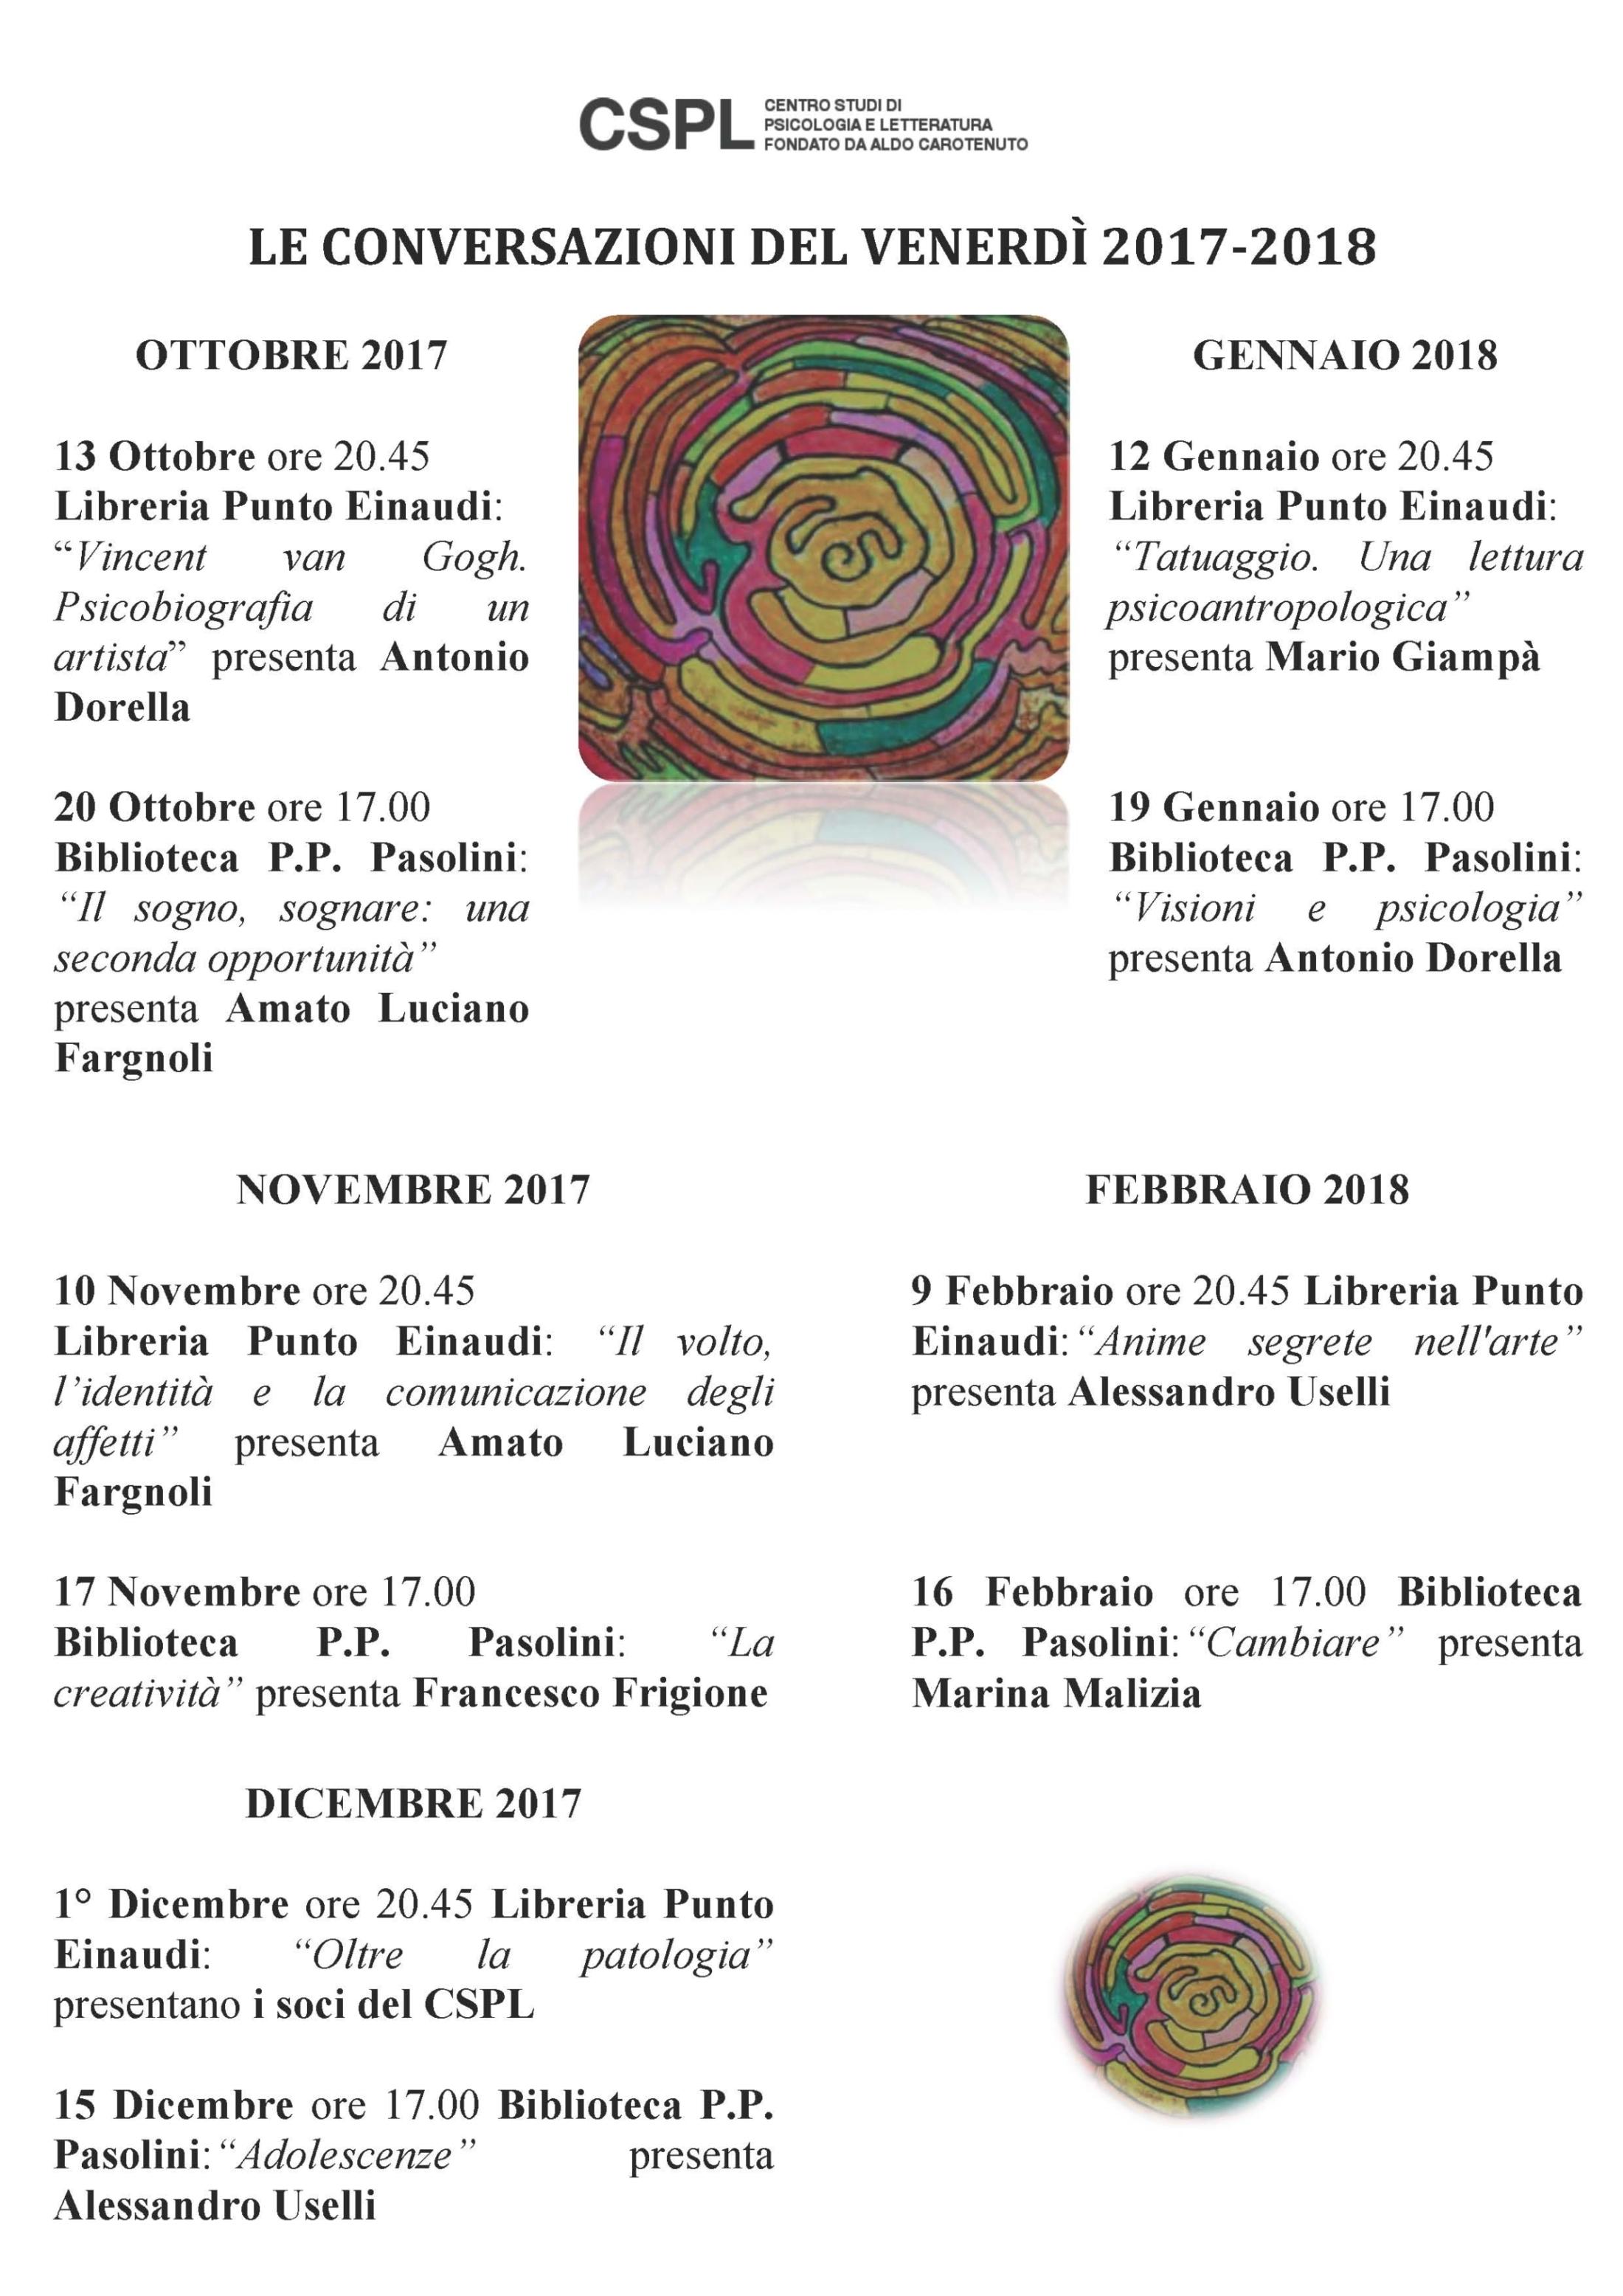 Le Conversazioni del Venerdì 2017-2018